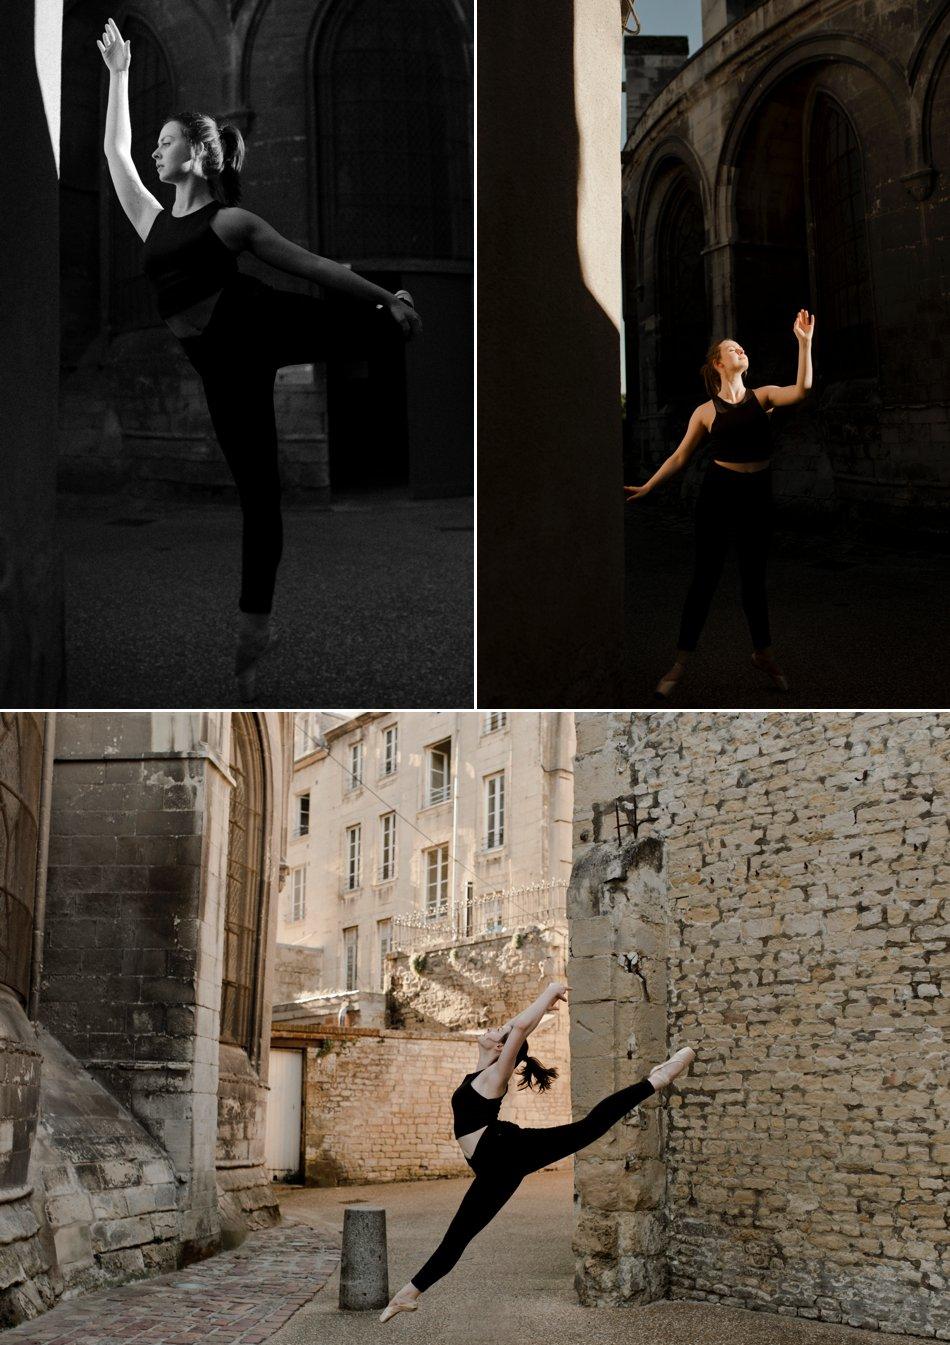 Séance photo danseuse contemporaine